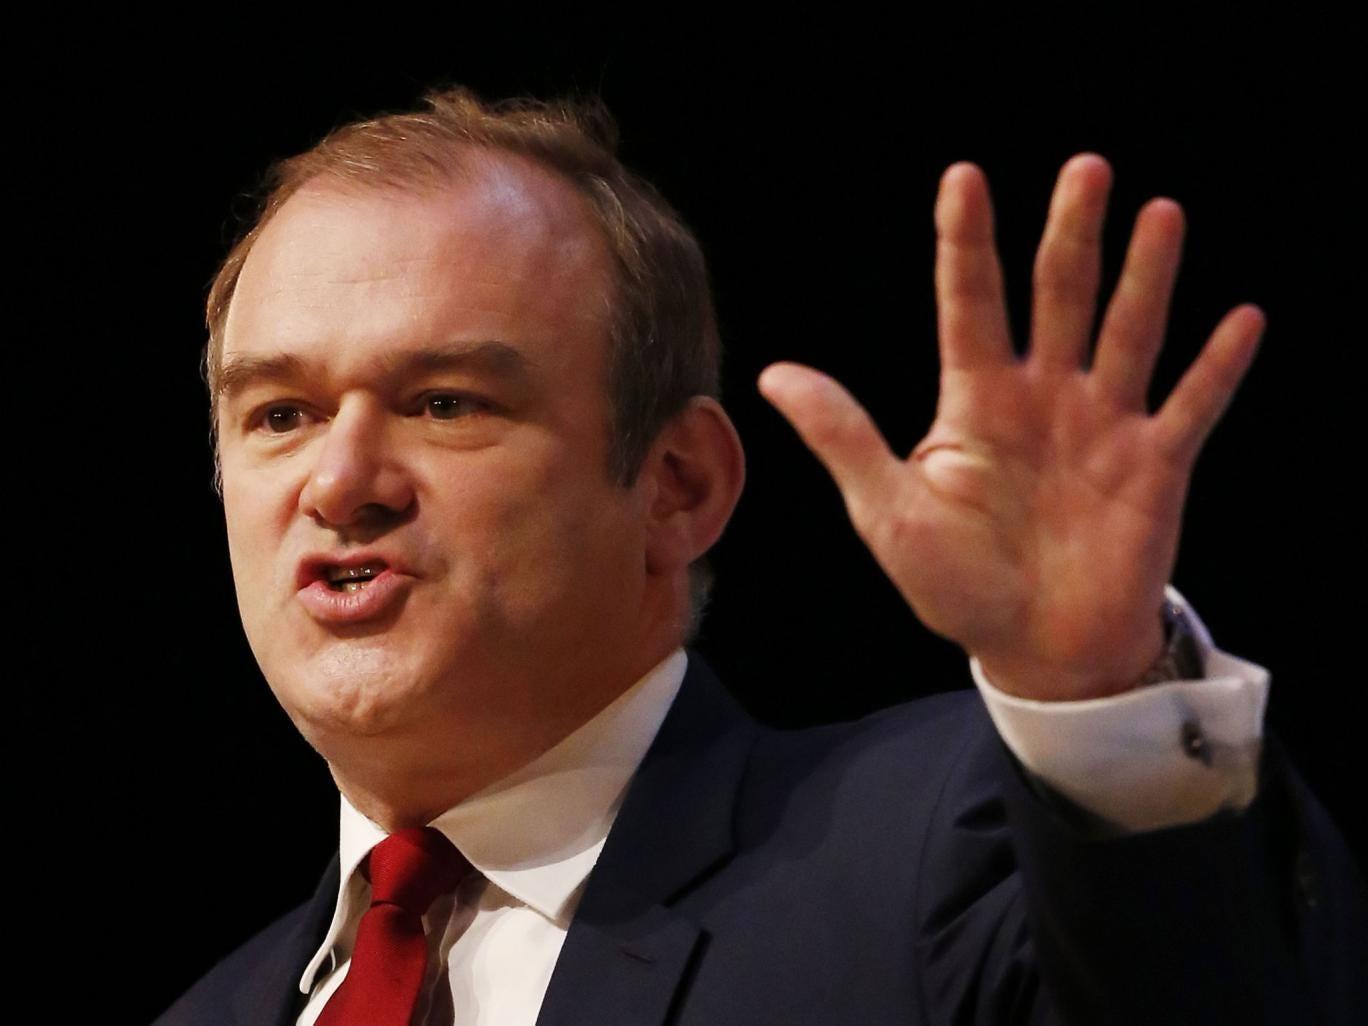 Liberal Democrat cabinet minister Ed Davey